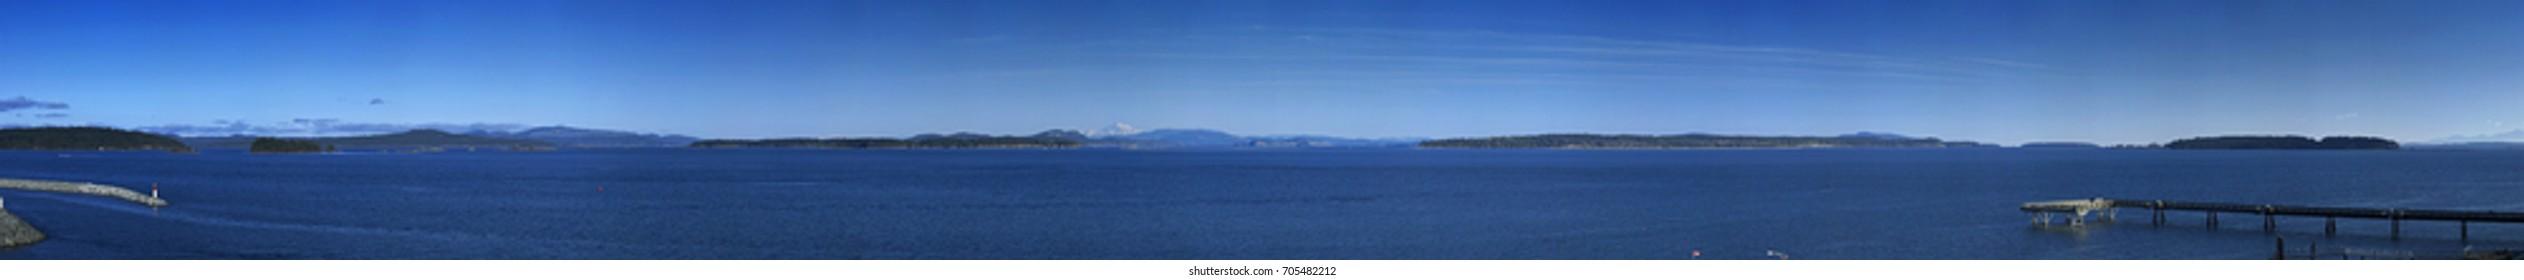 Panorama of the Salish Sea, Gulf Islands, BC, Canada and the San Juan Islands, Mt. Baker and the Cascade Range mountains, WA, USA